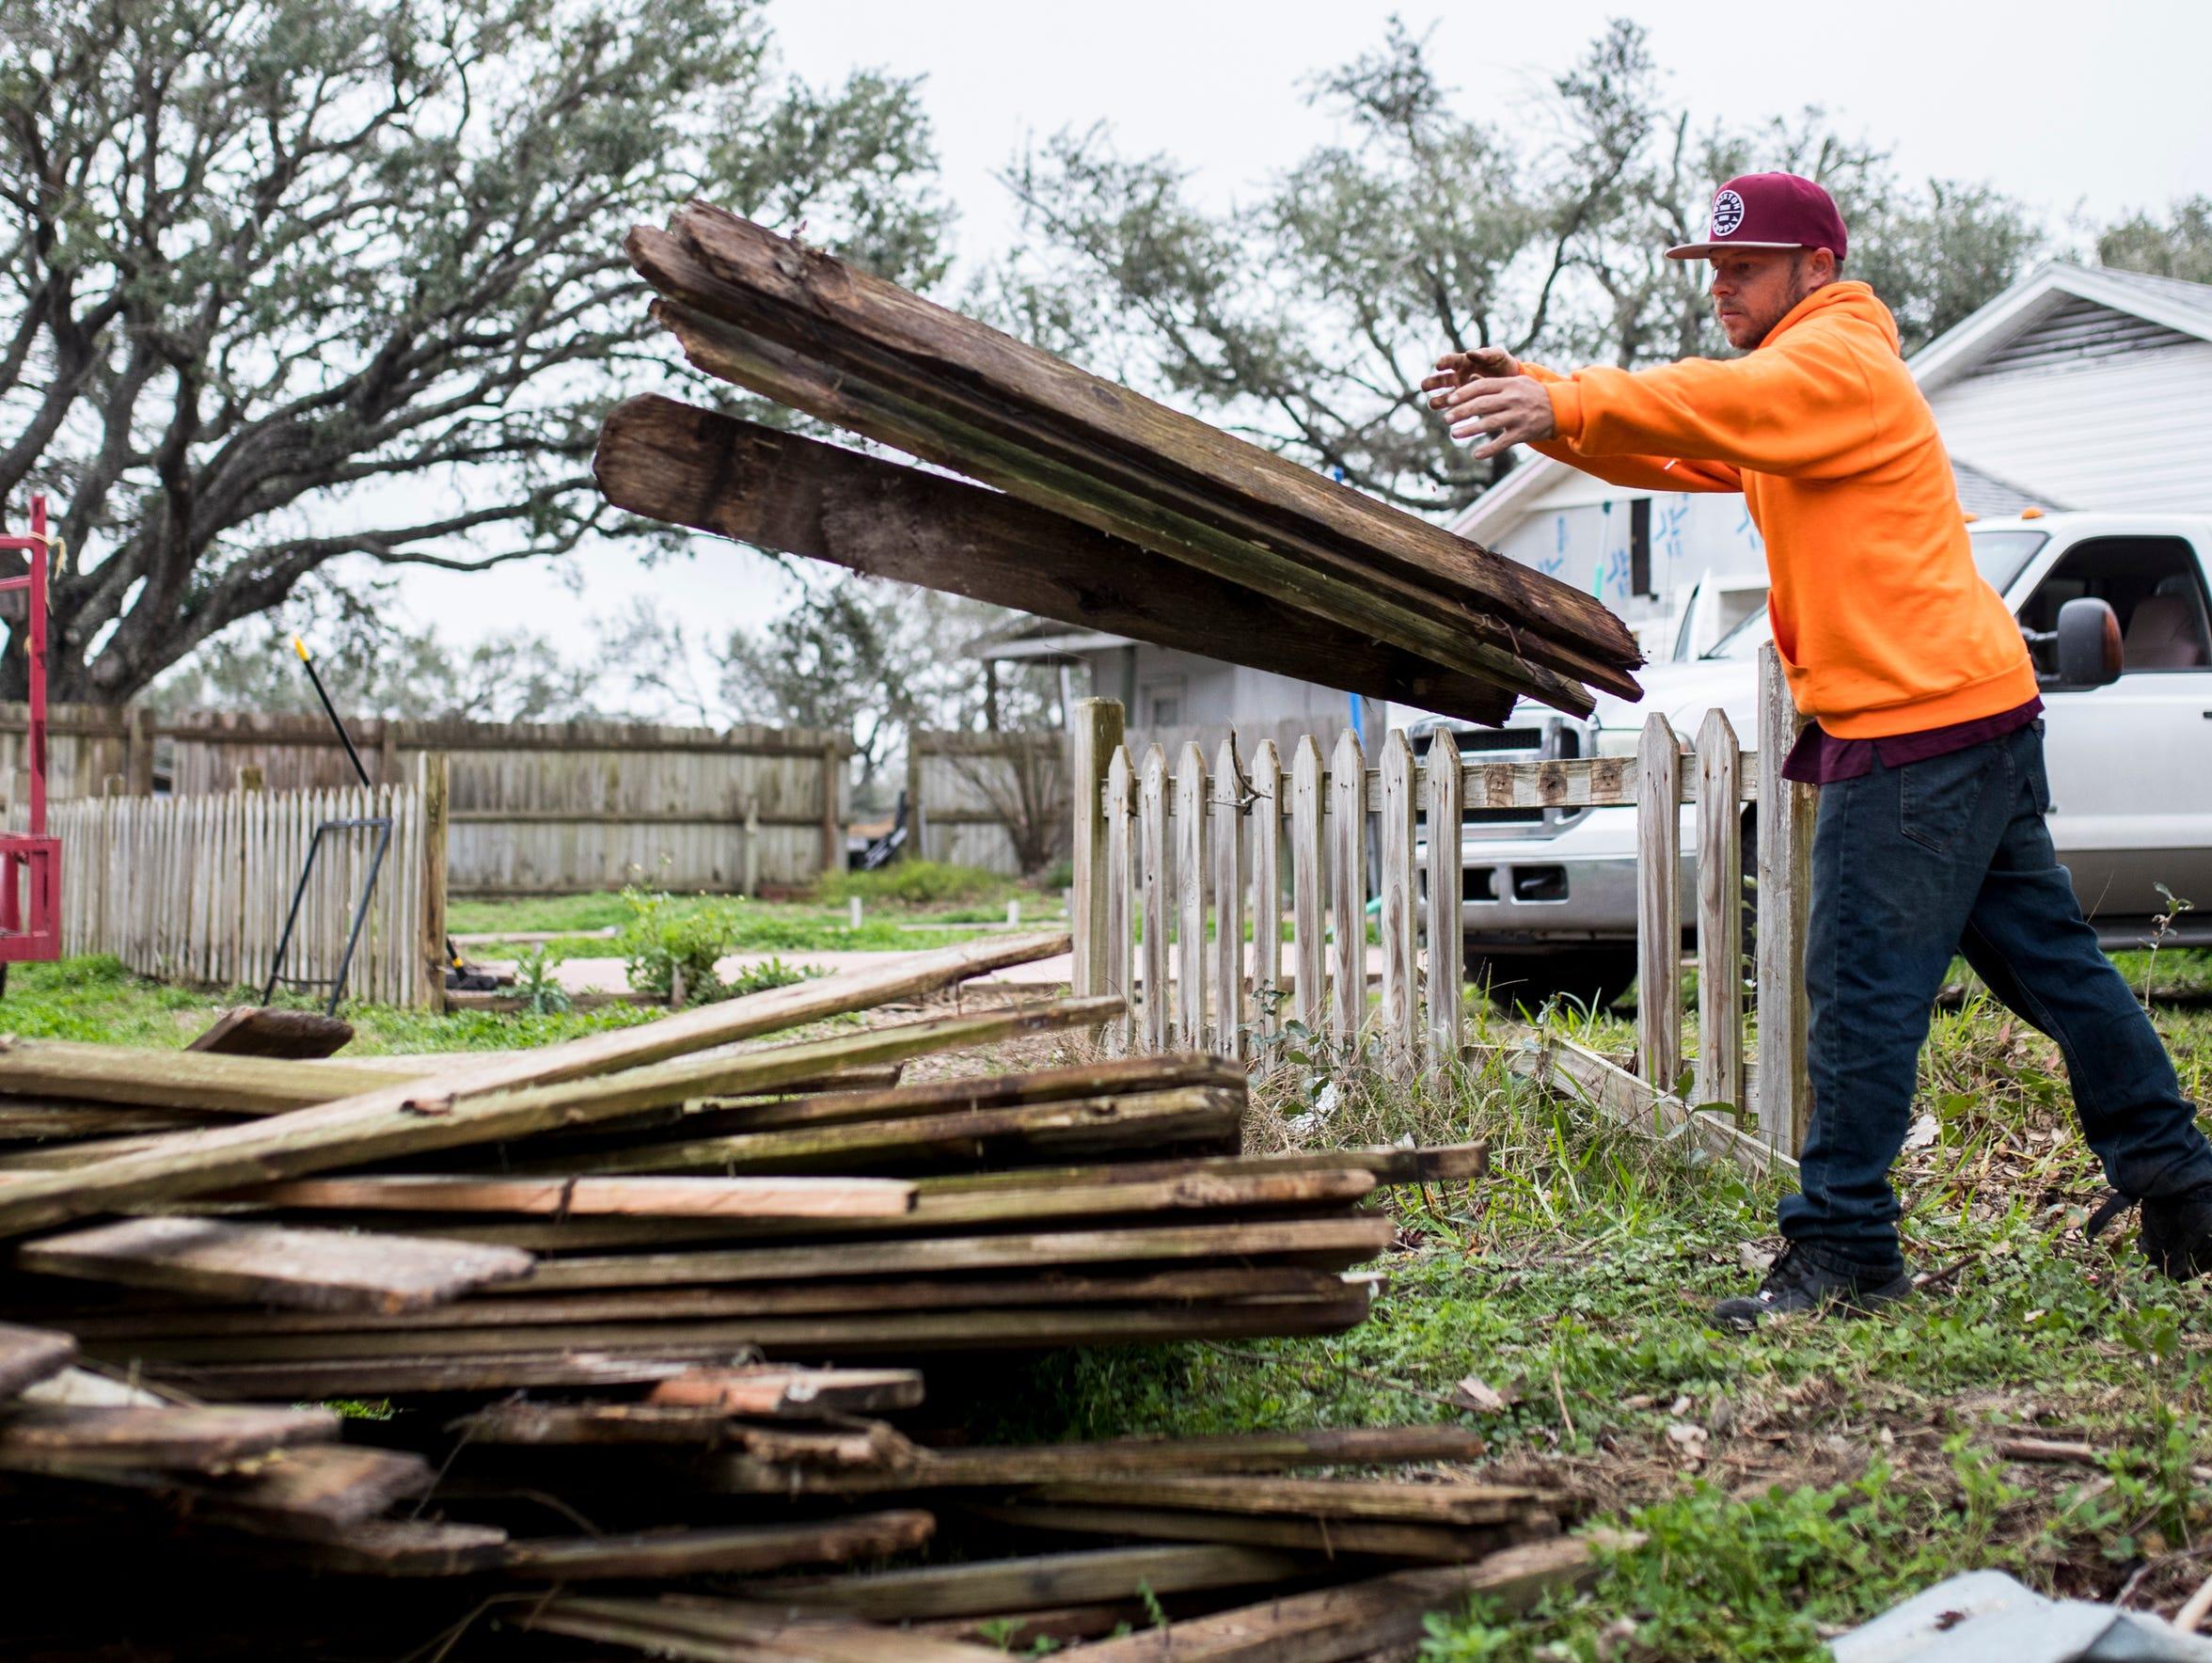 Jason Wright throws wood onto a pile of debris near